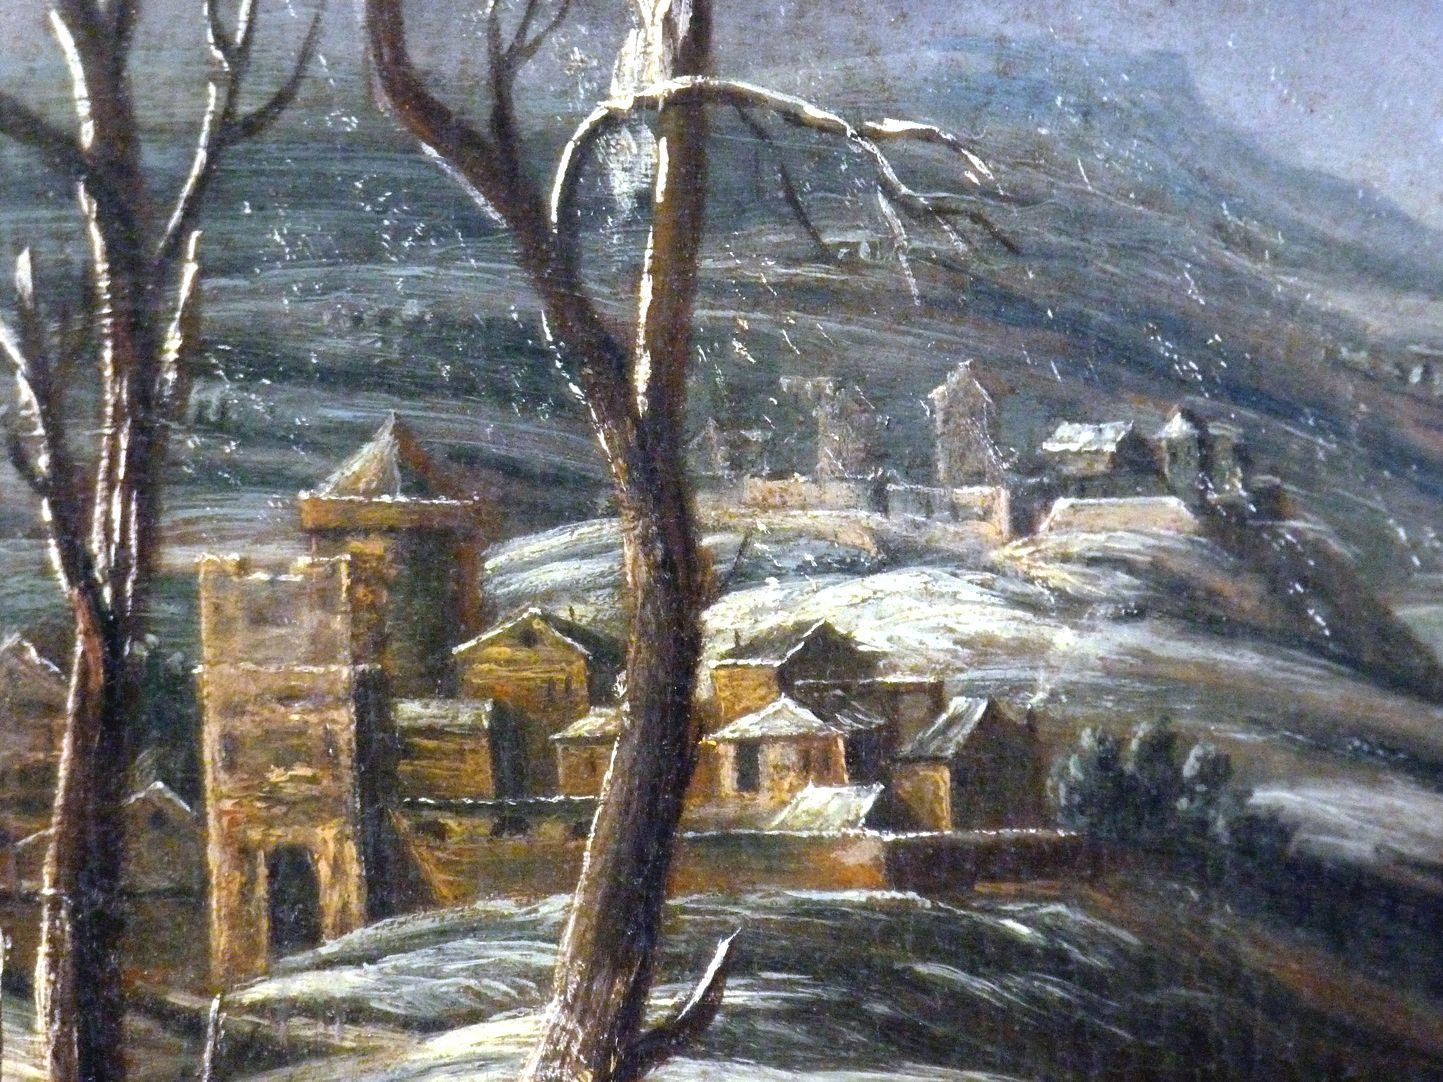 Winterlandschaft Detail, mittlerer linker Bildrand